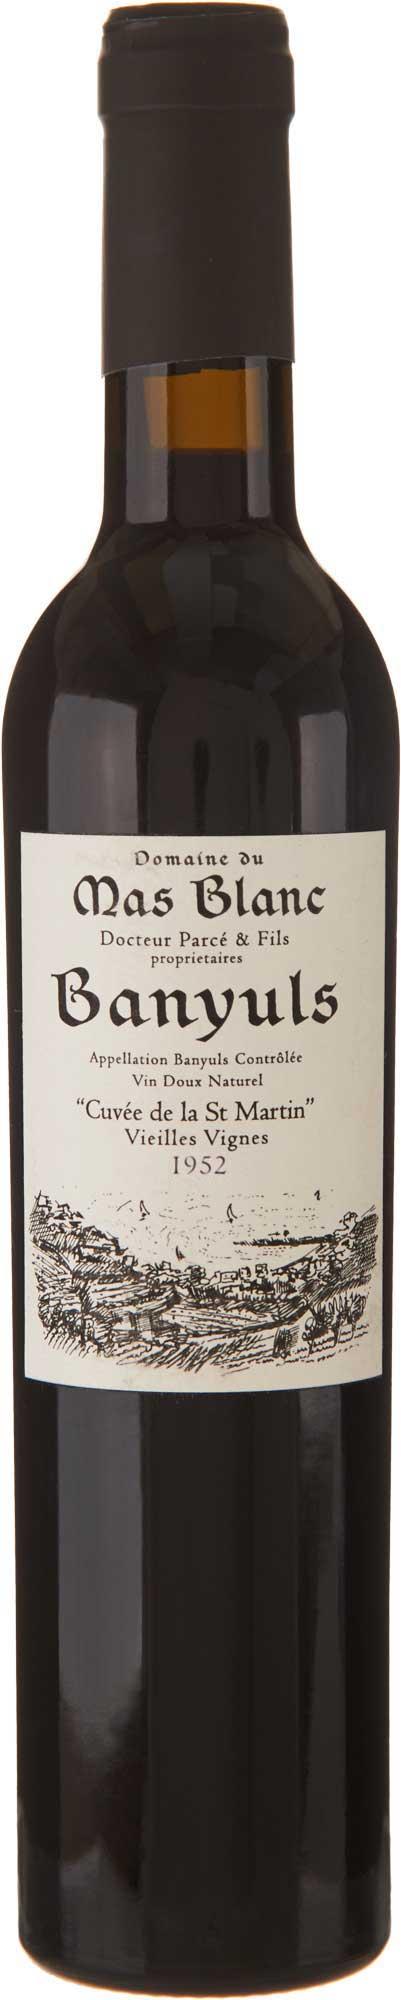 Domaine du Mas Blanc Banyuls 'Cuvée St. Martin' 1952